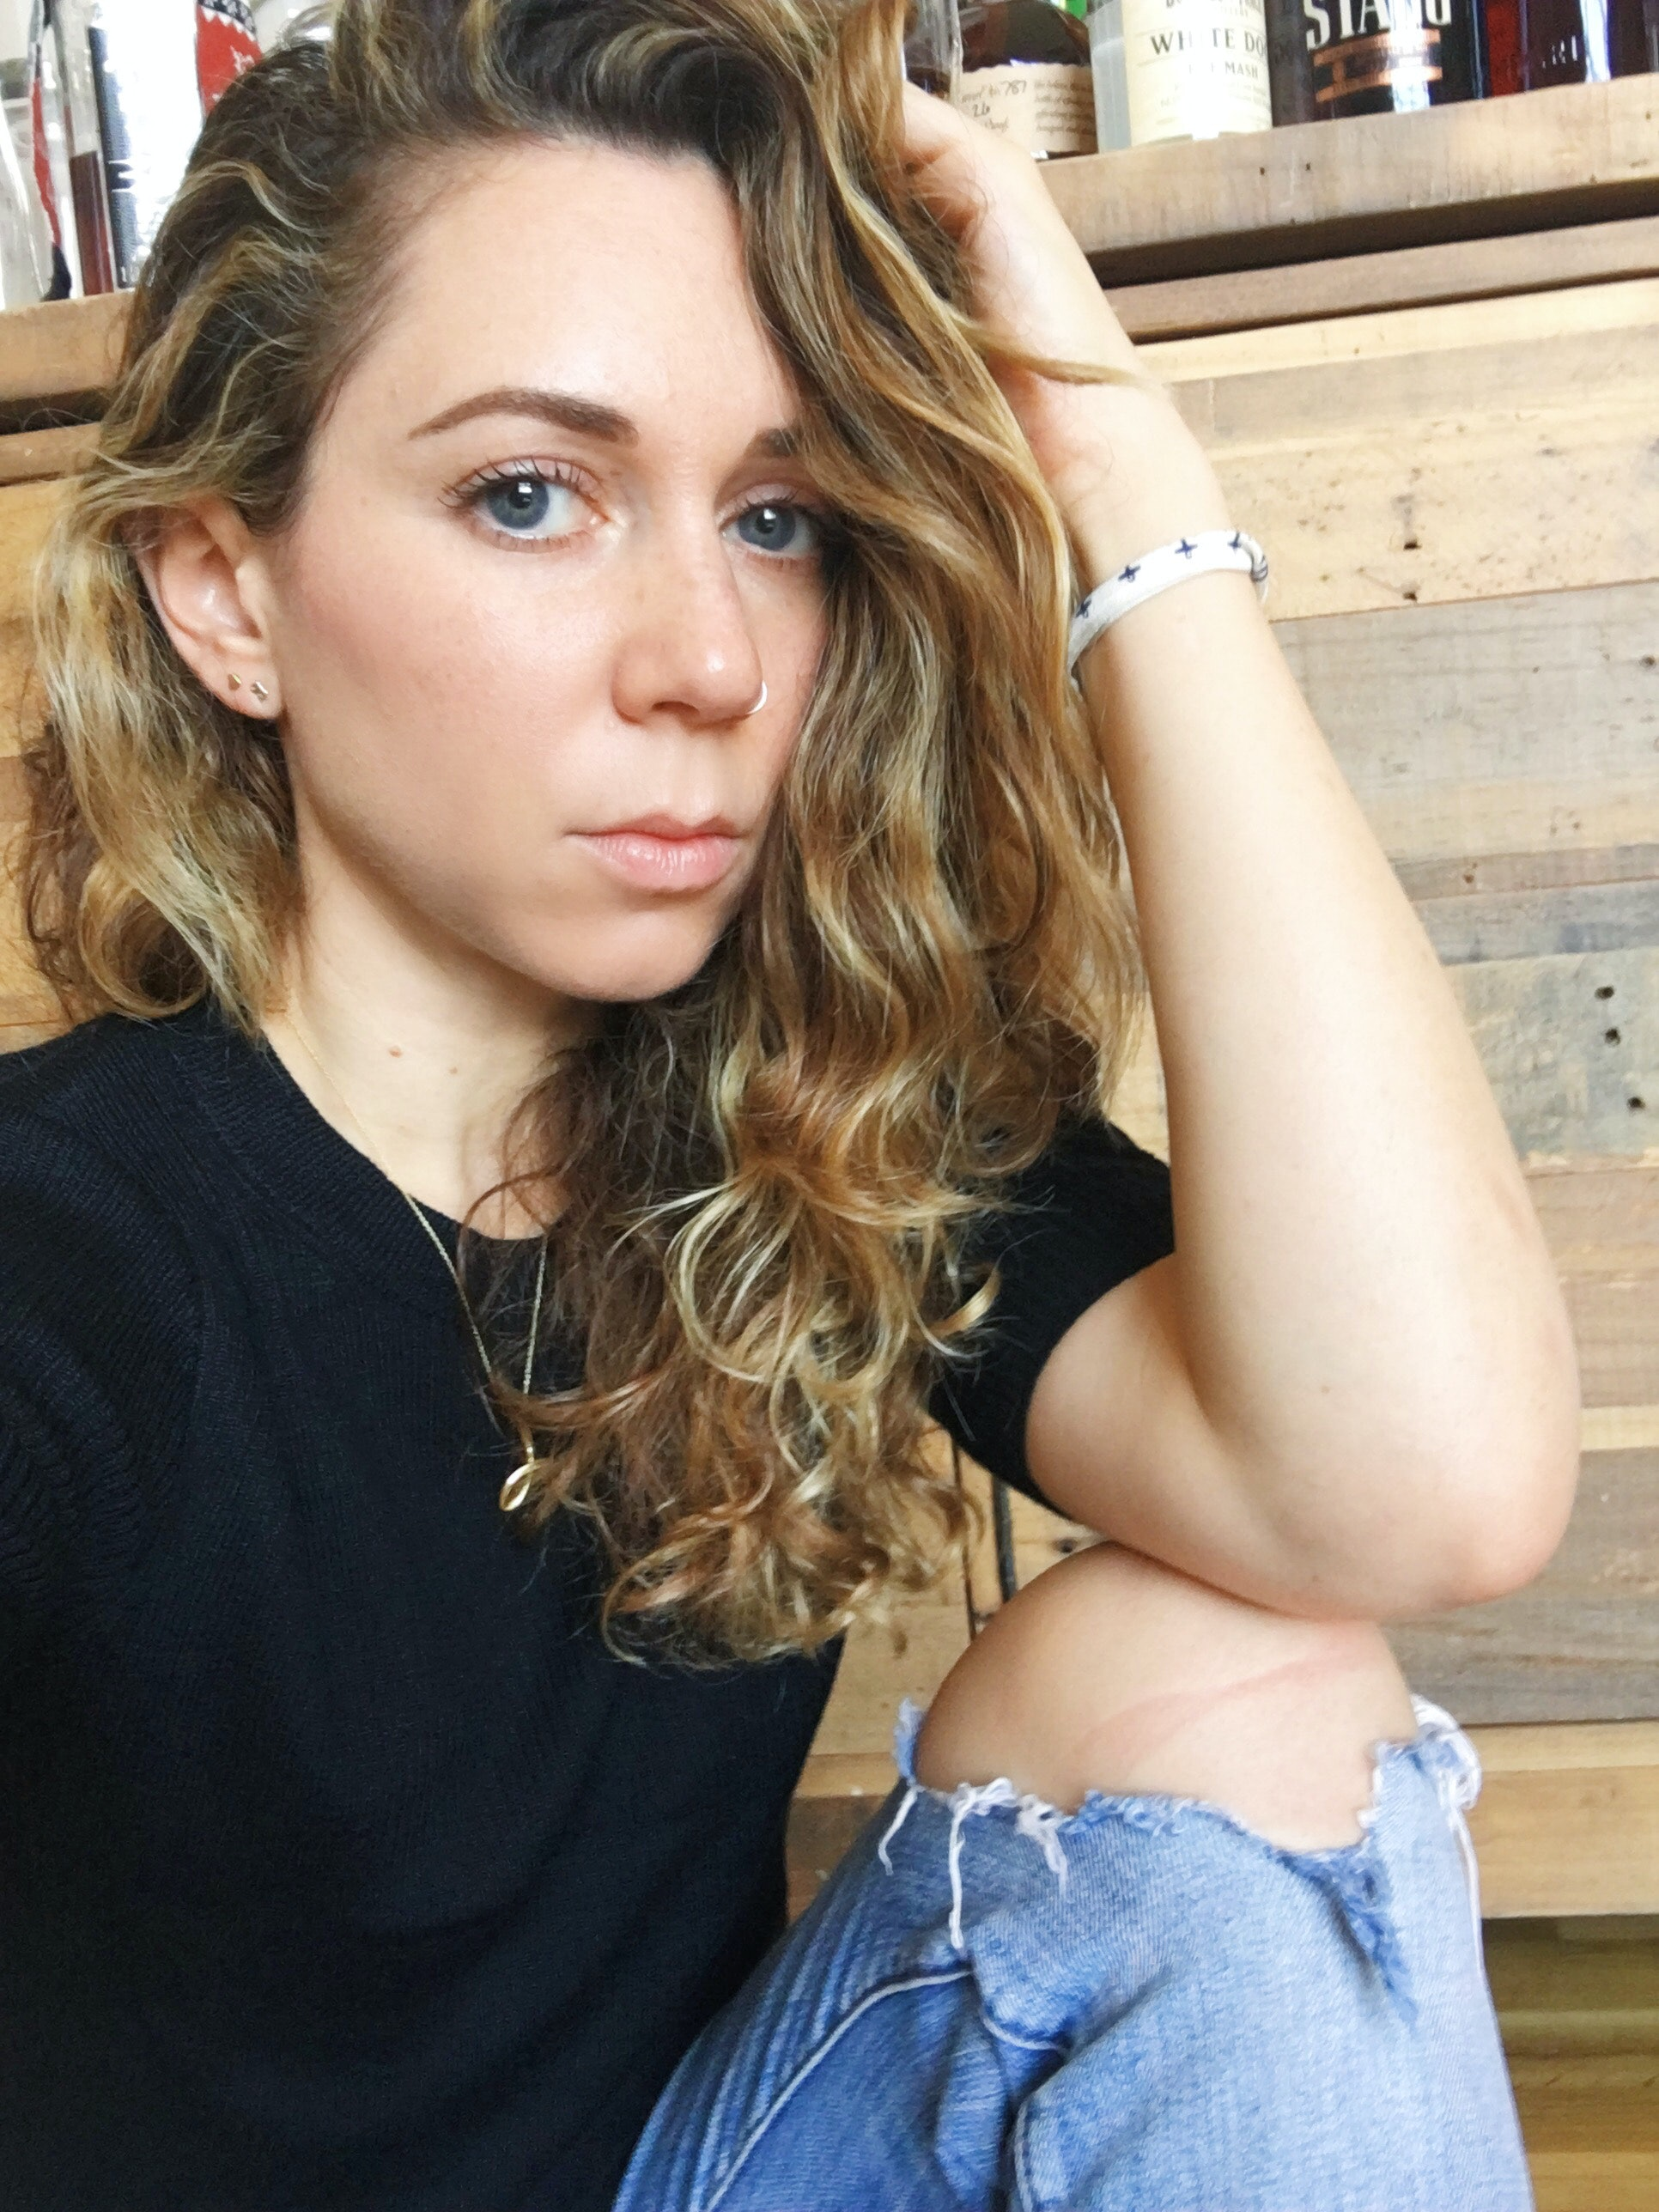 Girl with dildo photo